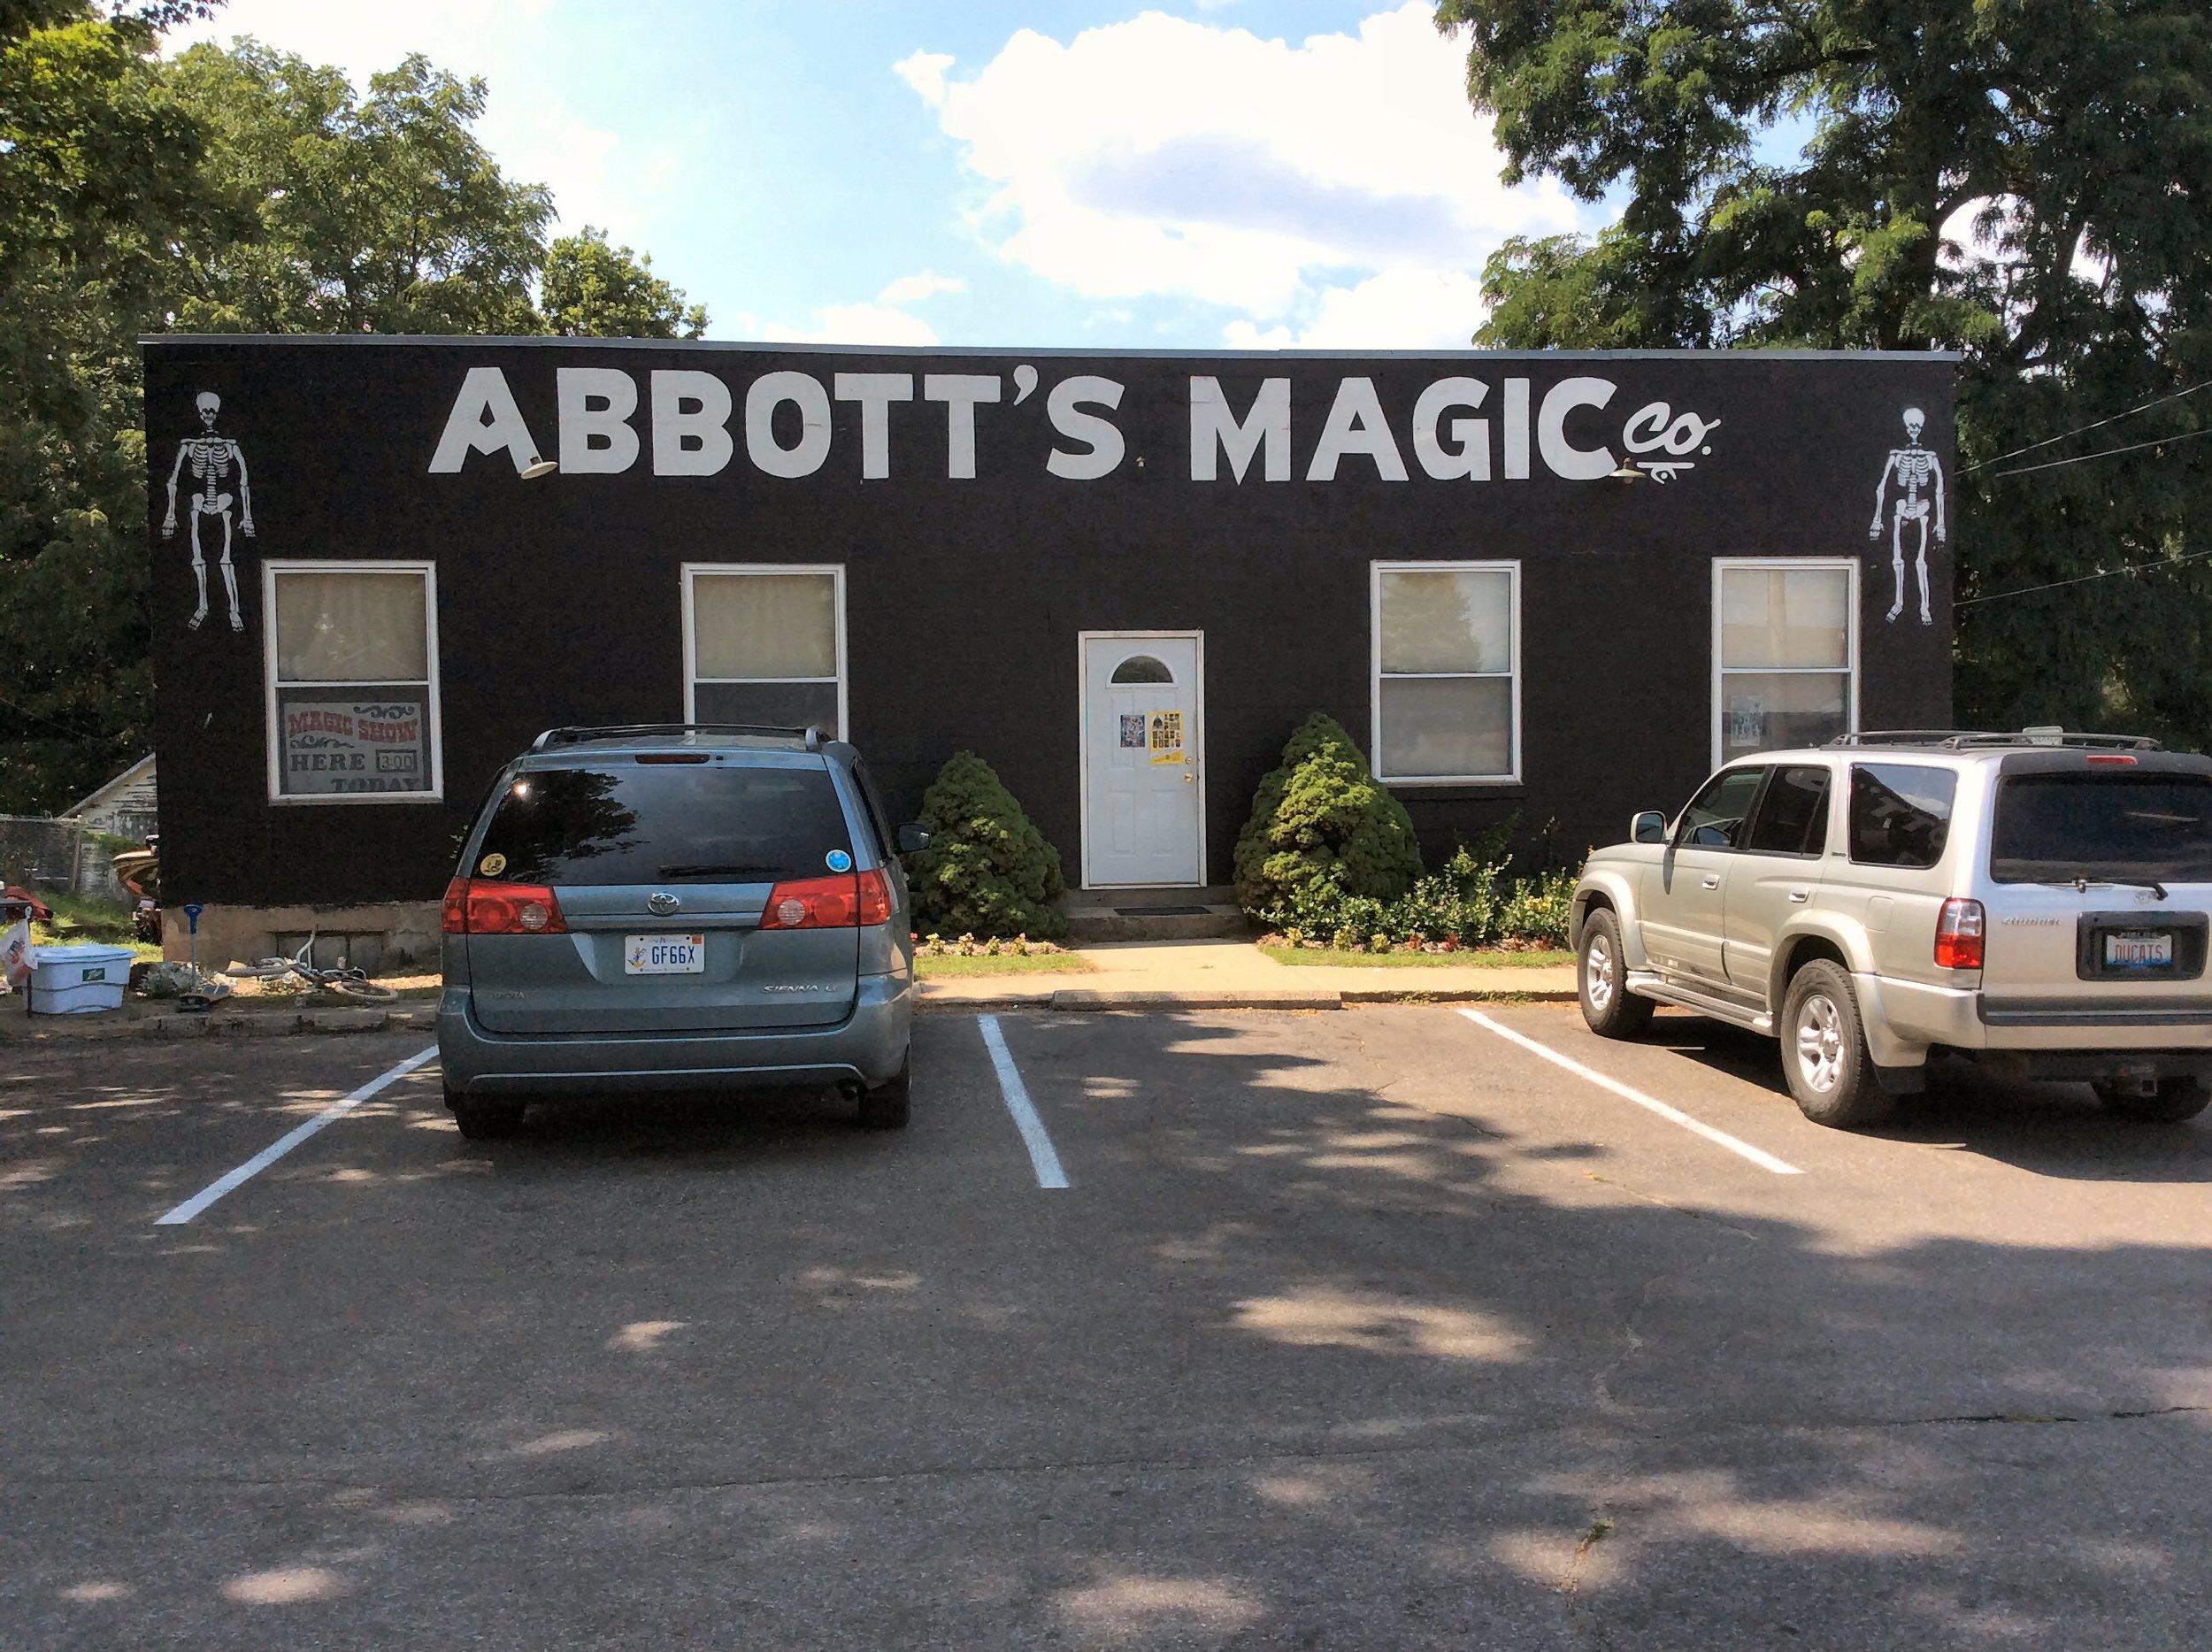 Abbott's Magic Company store front